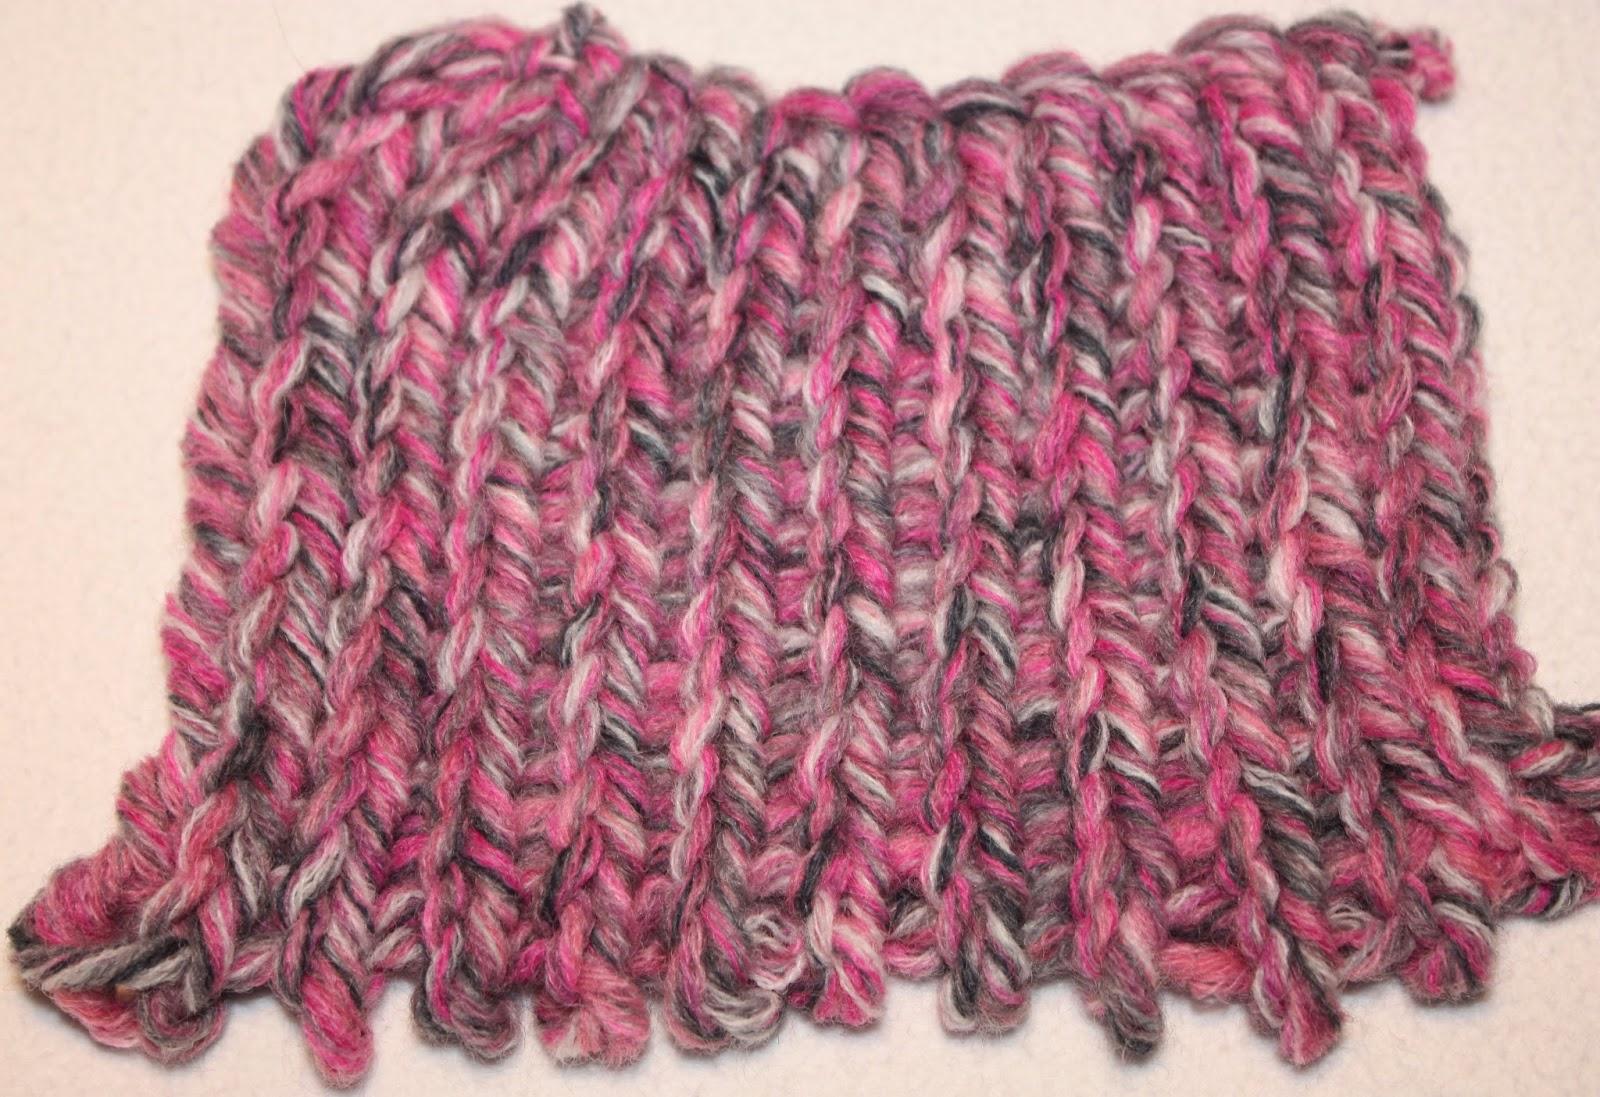 breiring; breiraam; breien; steek; tricotsteek; steken; breisteek; breisteken; loom; knitting; dubbelzijdig; dubbel; makkelijk; beginner; eenvoudig; hobby; hoe;